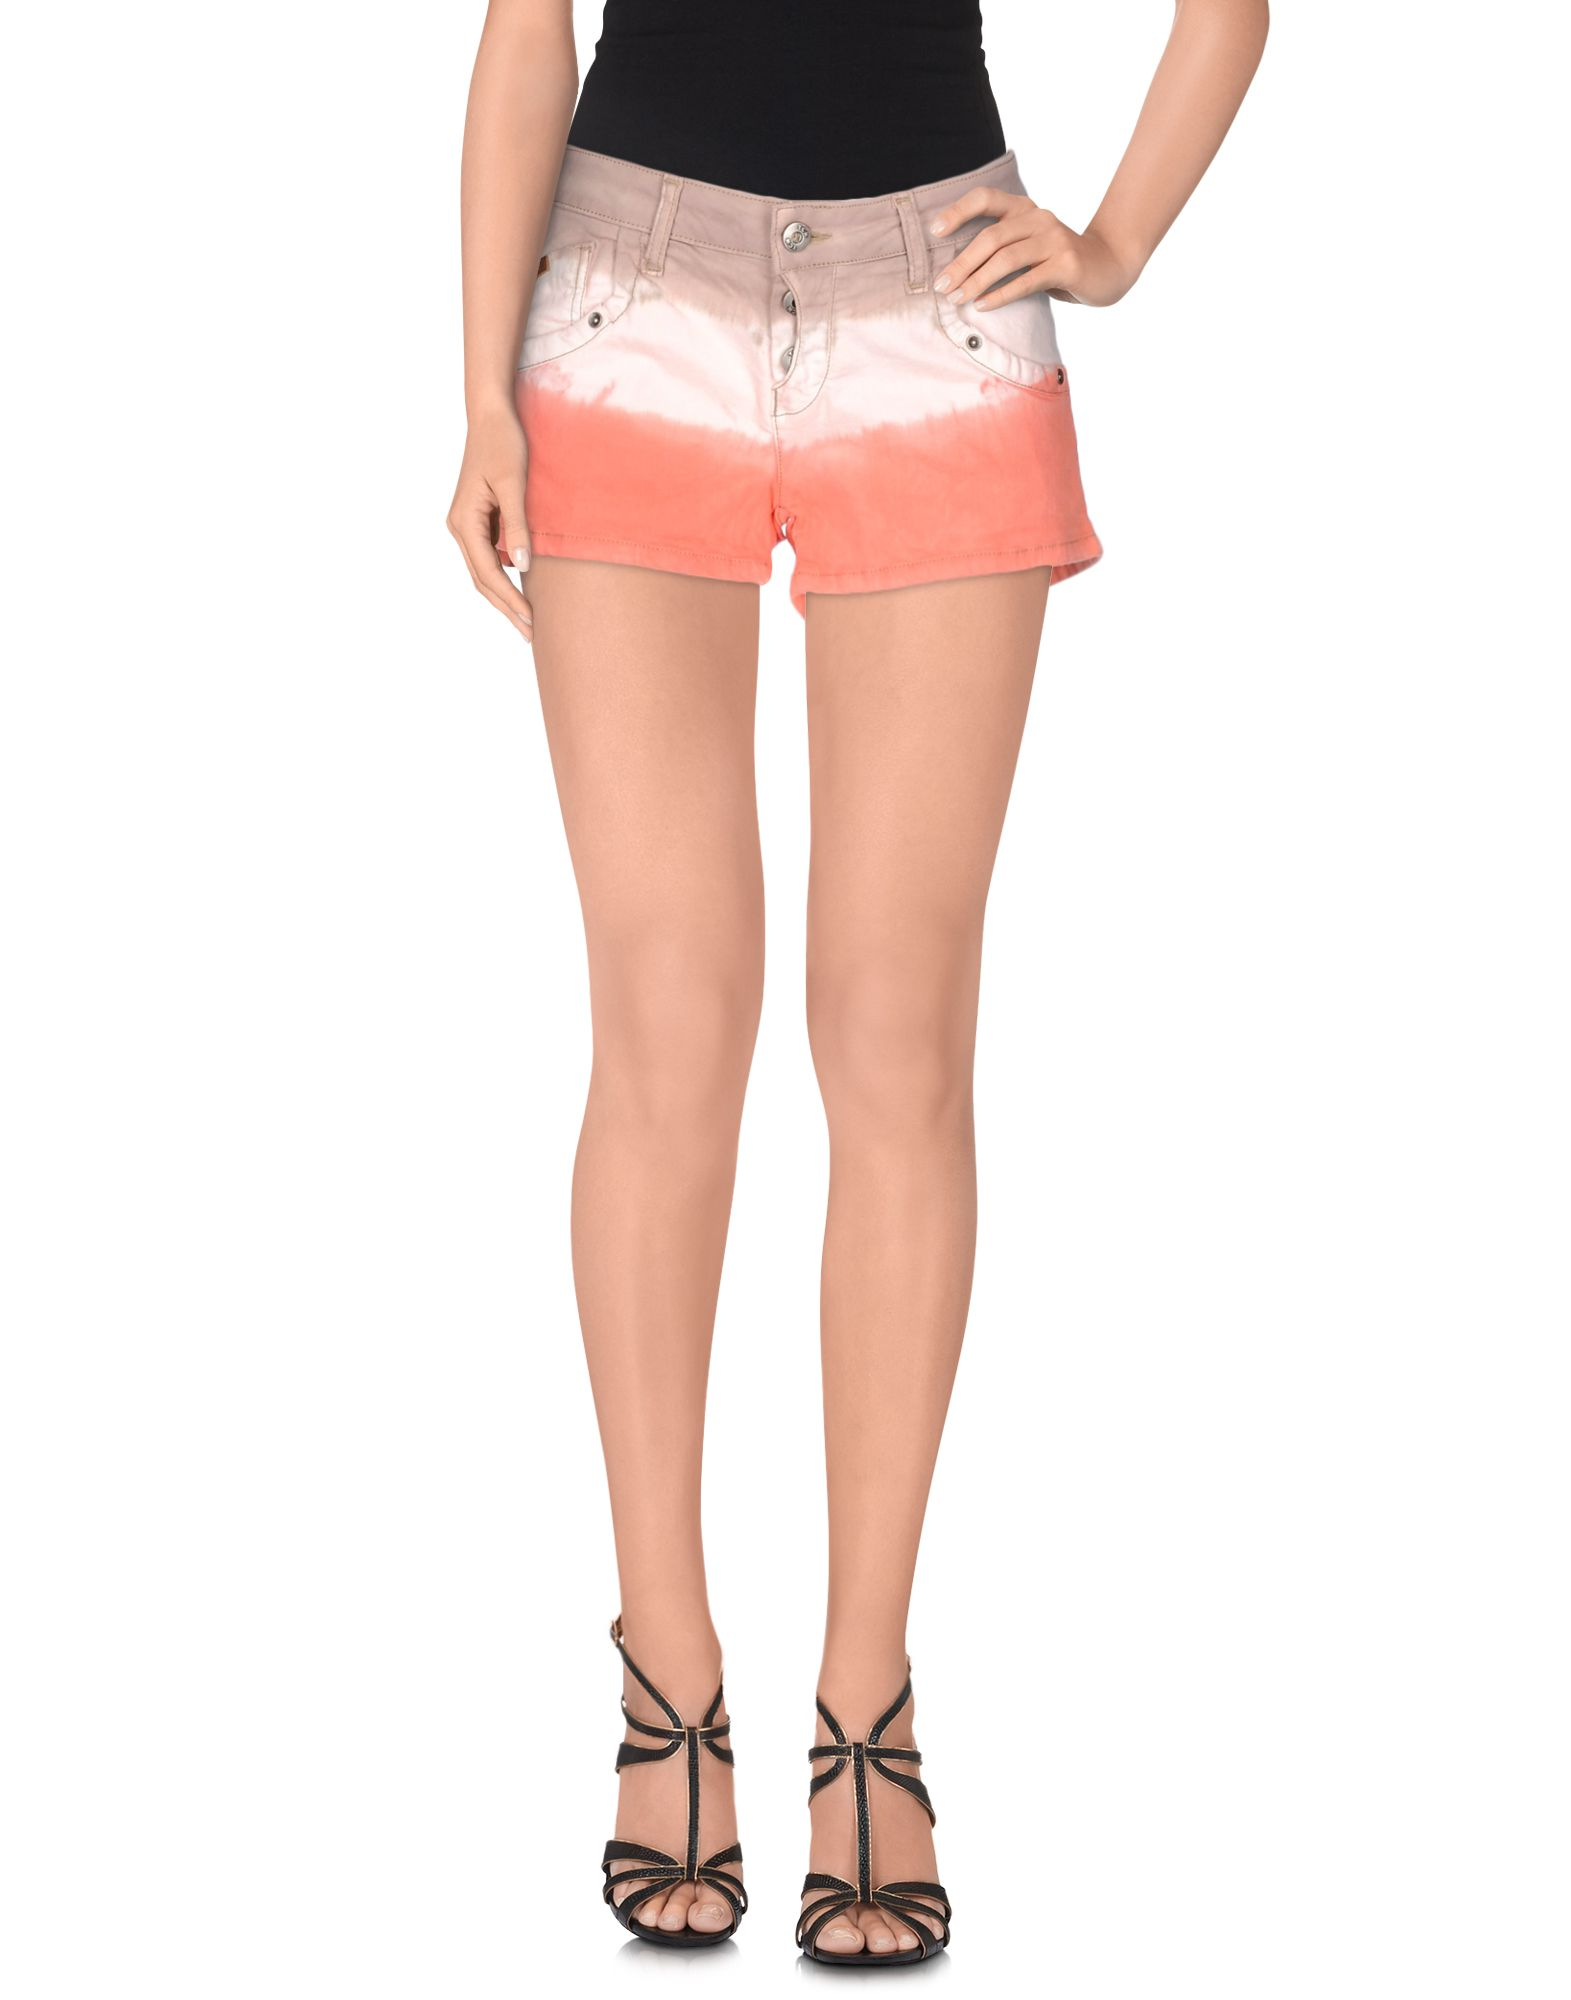 TOTON COMELLA - TCN Damen Jeansshorts Farbe Koralle Größe 5